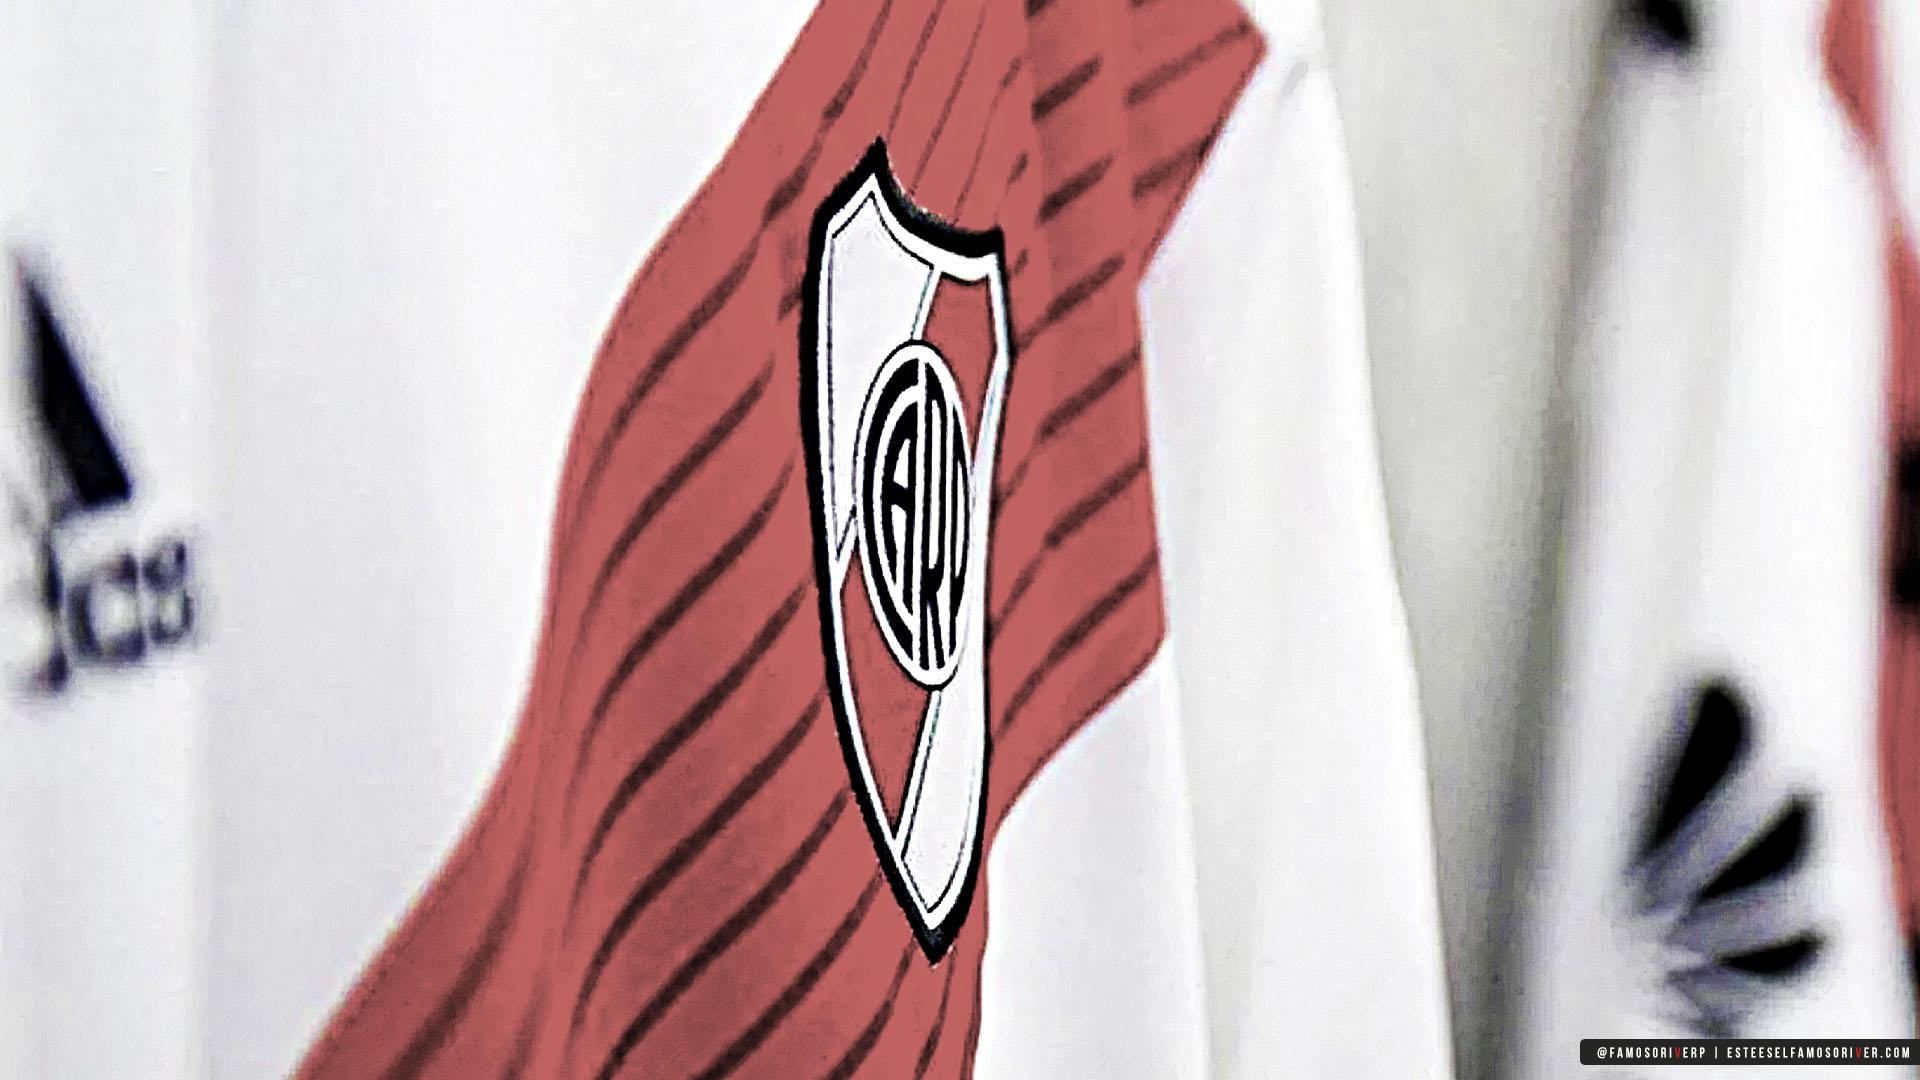 imagenes-de-River-Plate-para-fondos-de-pantalla-wallpaper-de-River-Camiseta de River Plate - Escudo